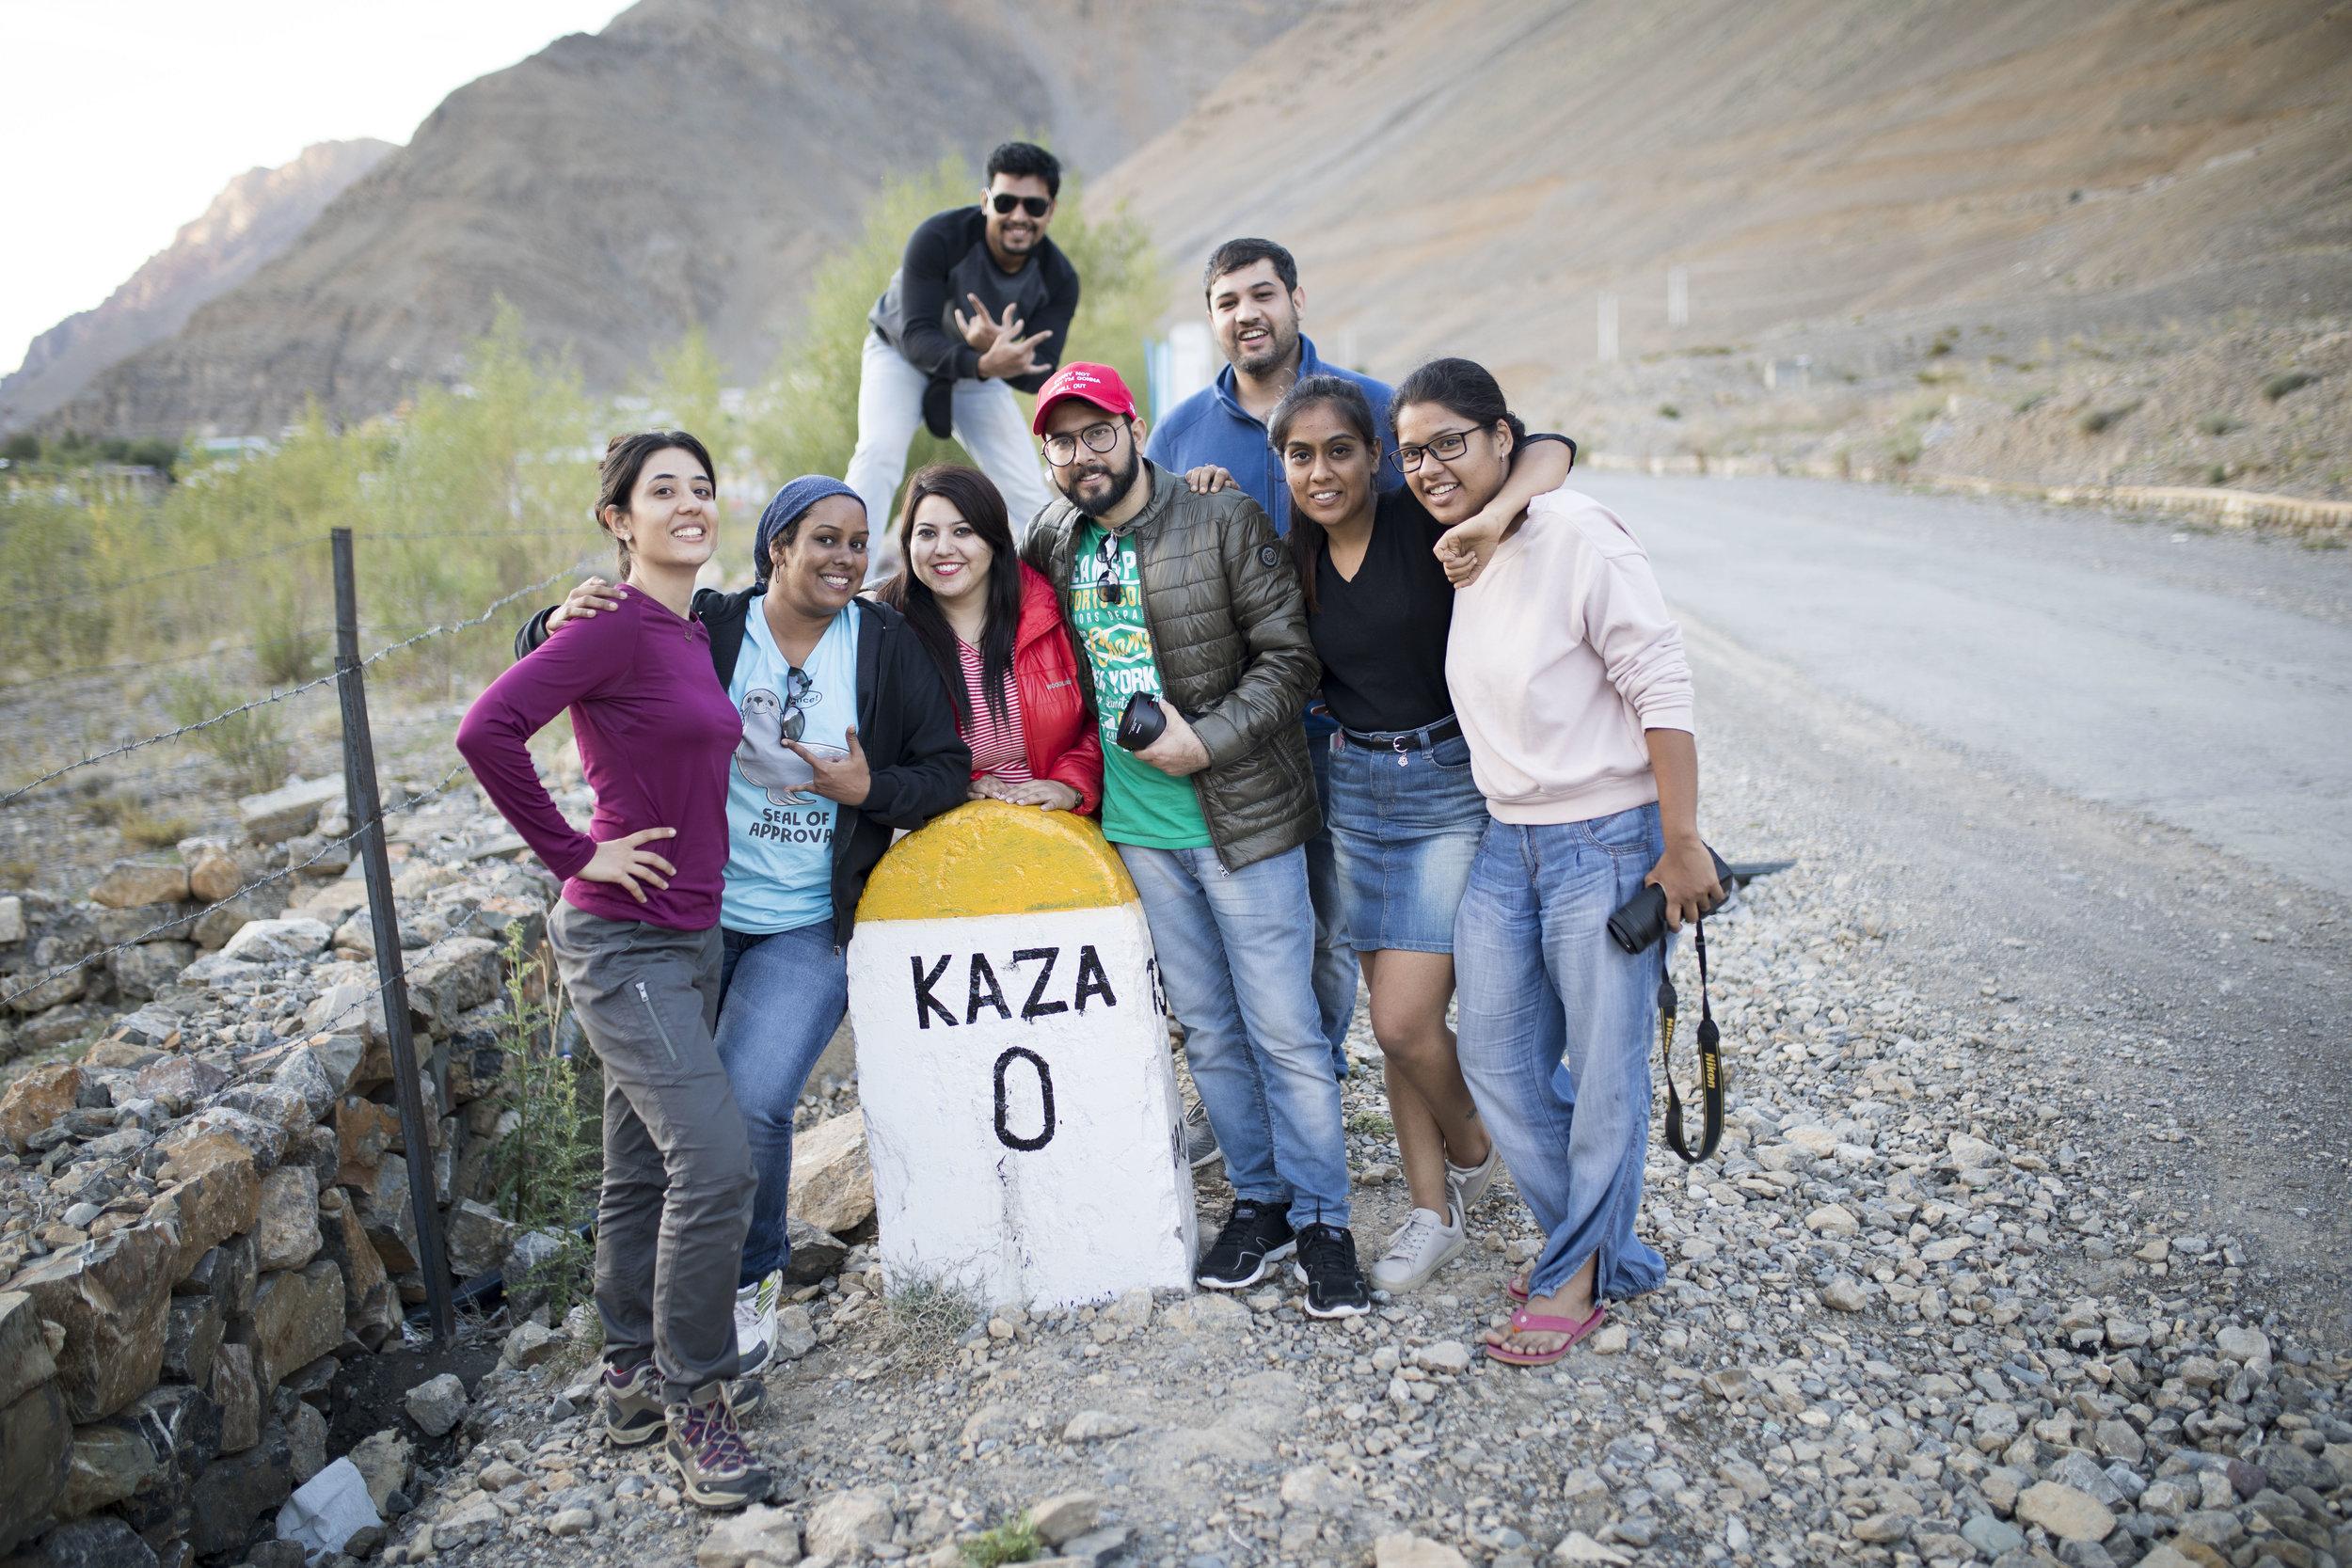 Kaza Milestone: Group Trip with Tripver Community